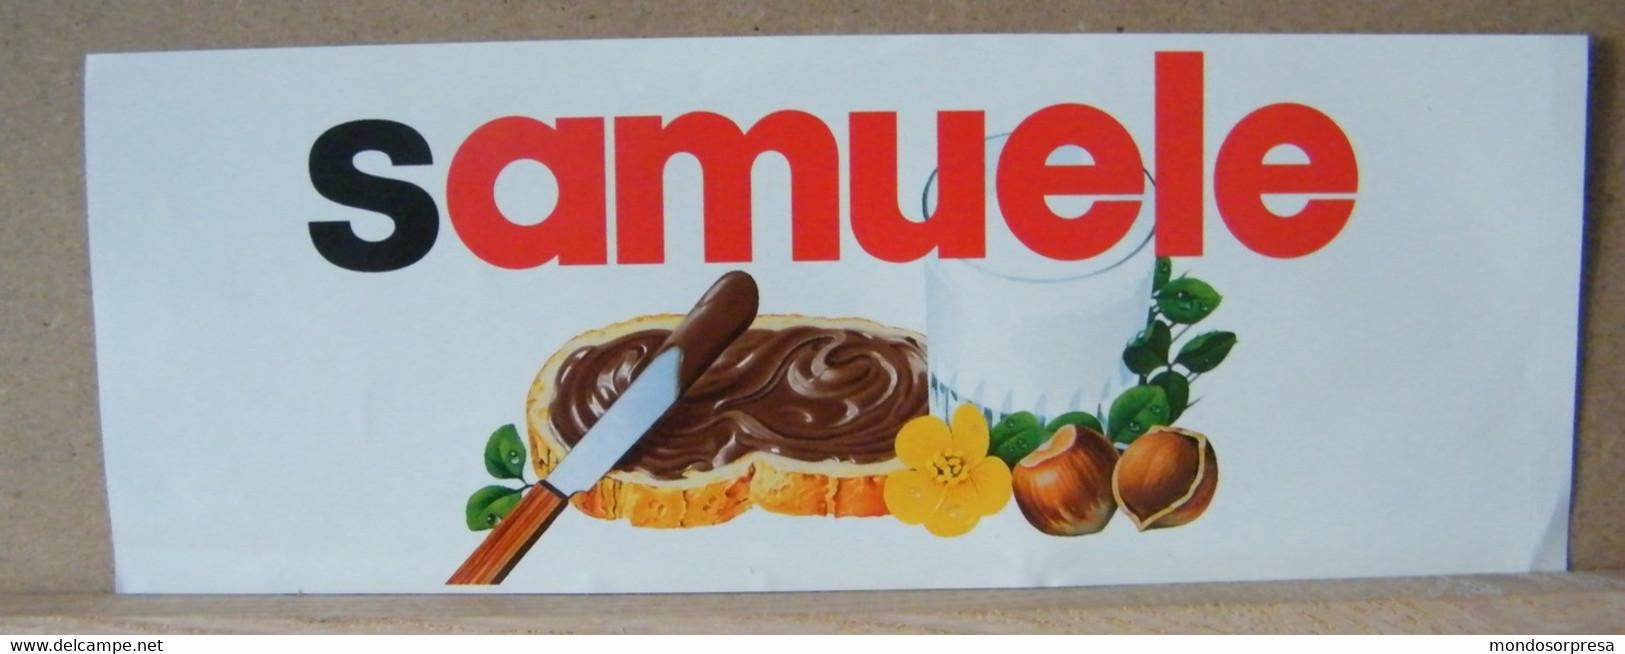 MONDOSORPRESA, ADESIVI NUTELLA NOMI, SAMUELE - Nutella